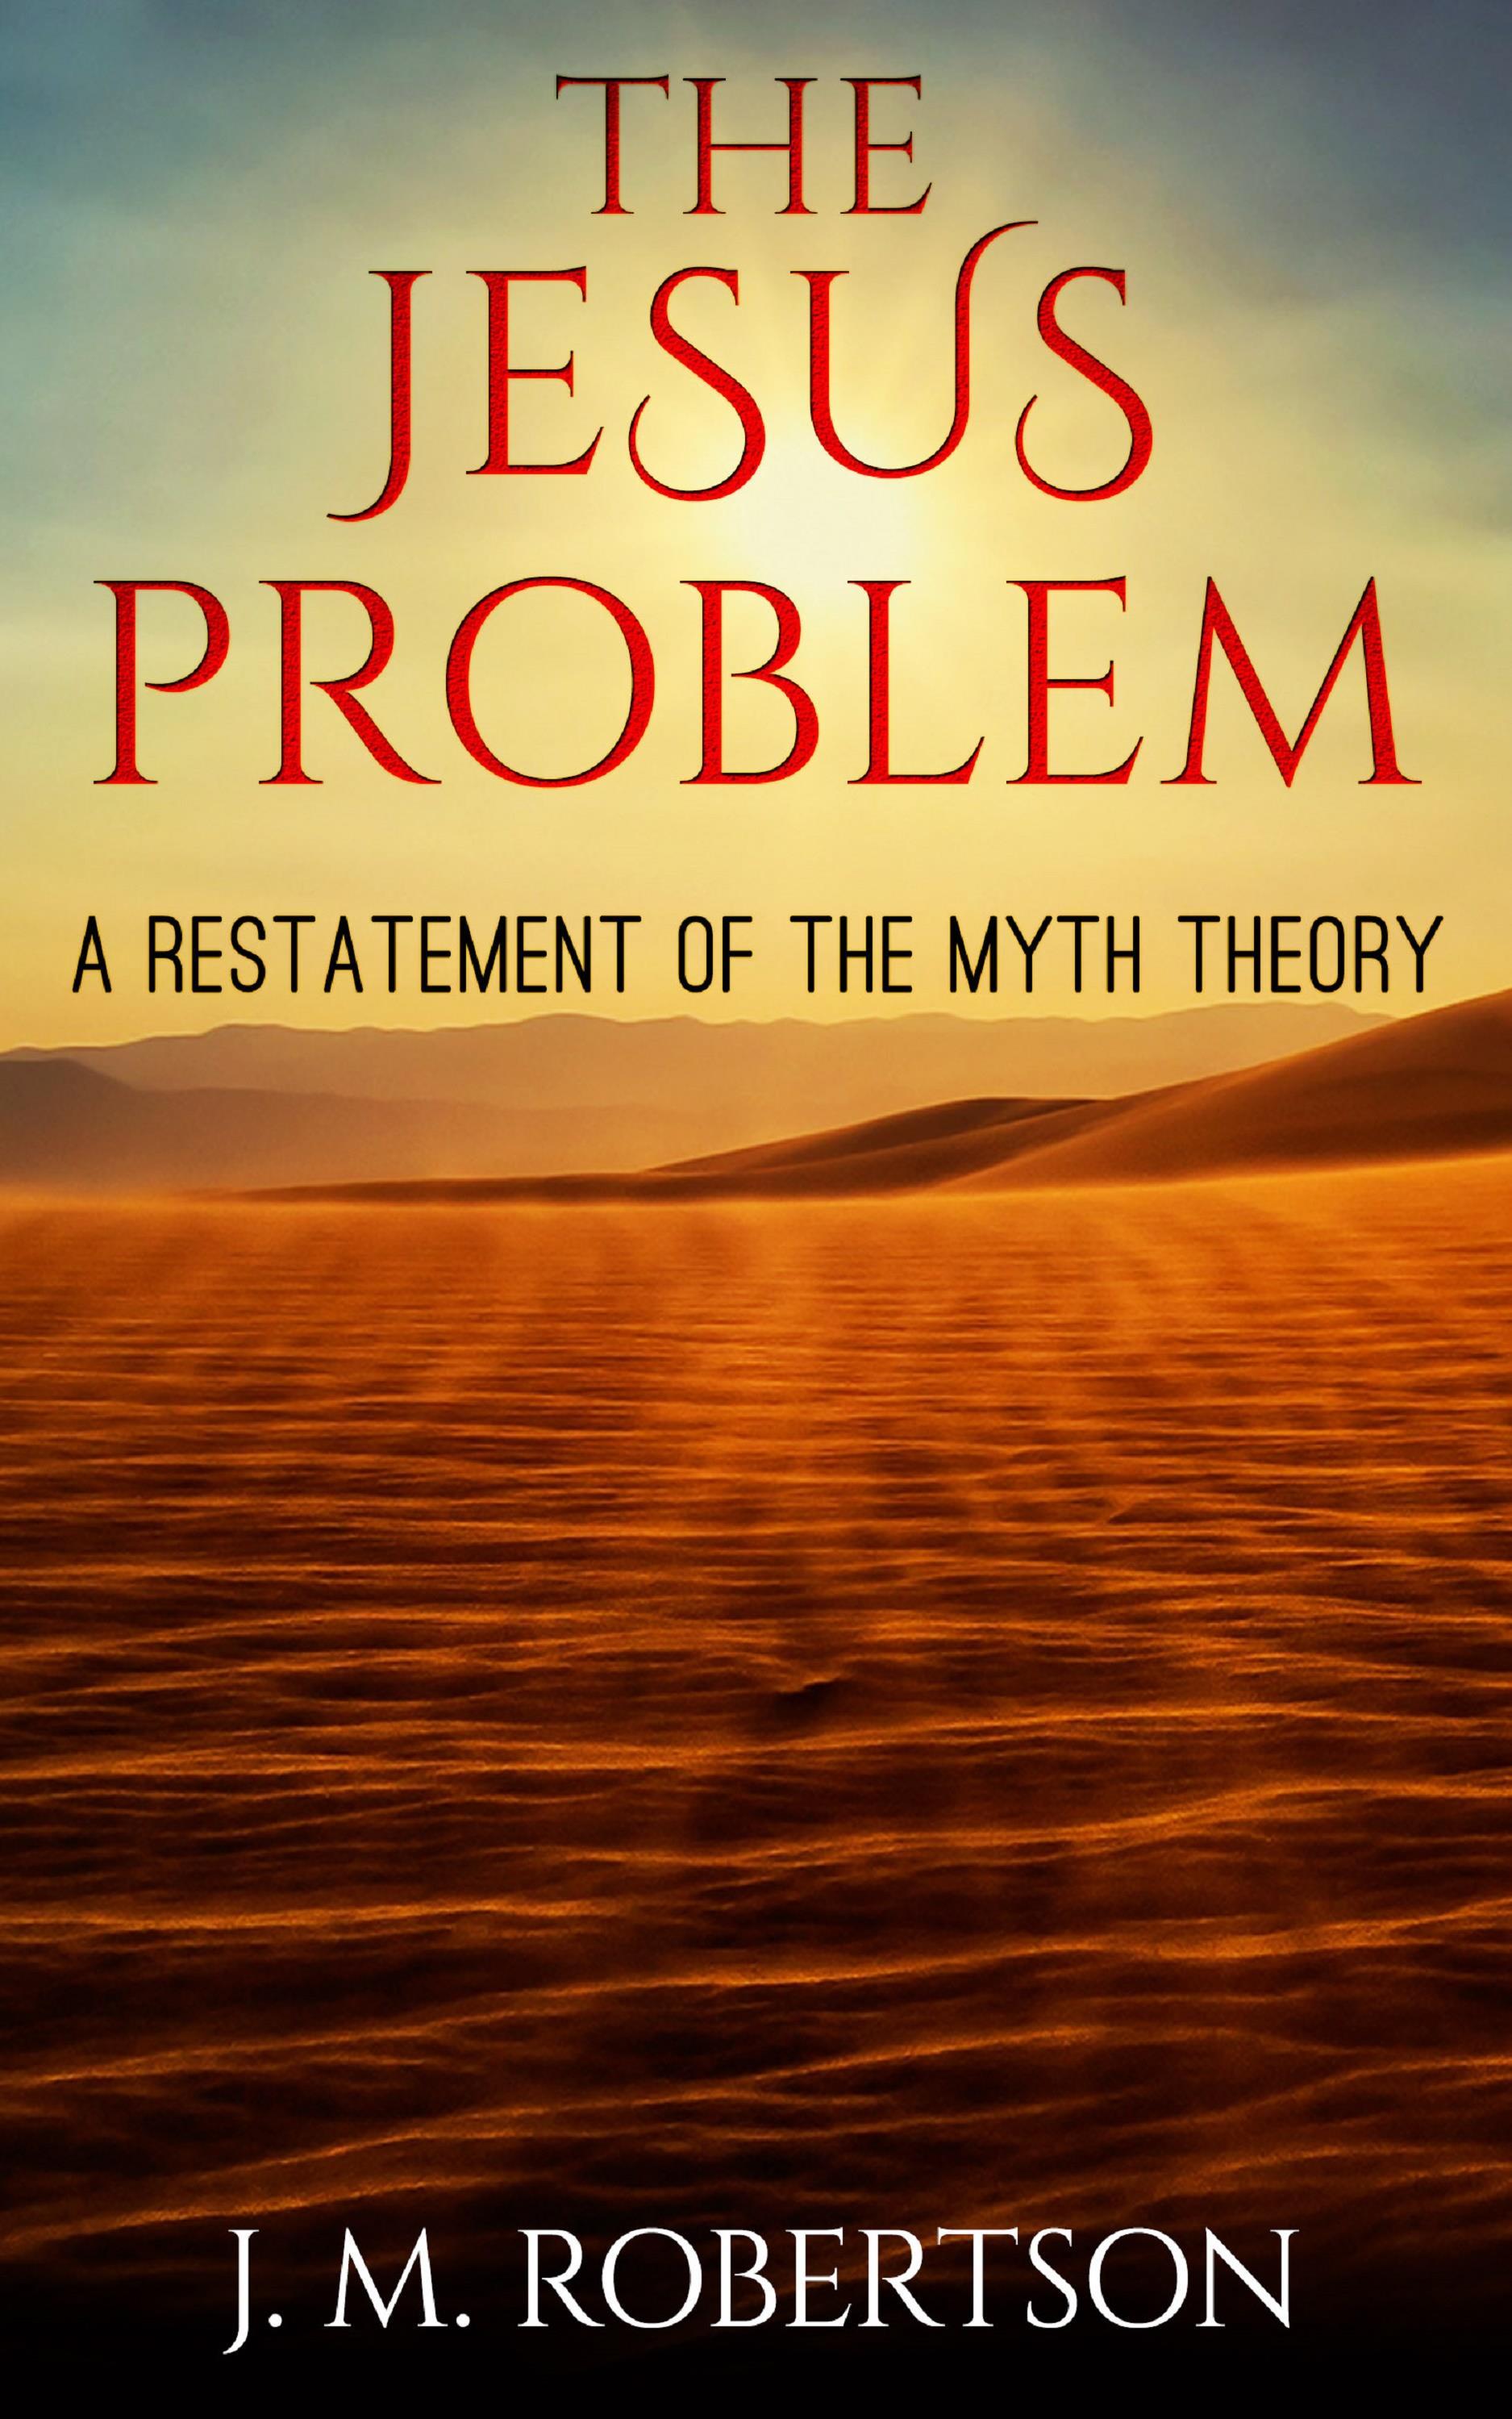 The Jesus Problem: A restatement of the myth theory